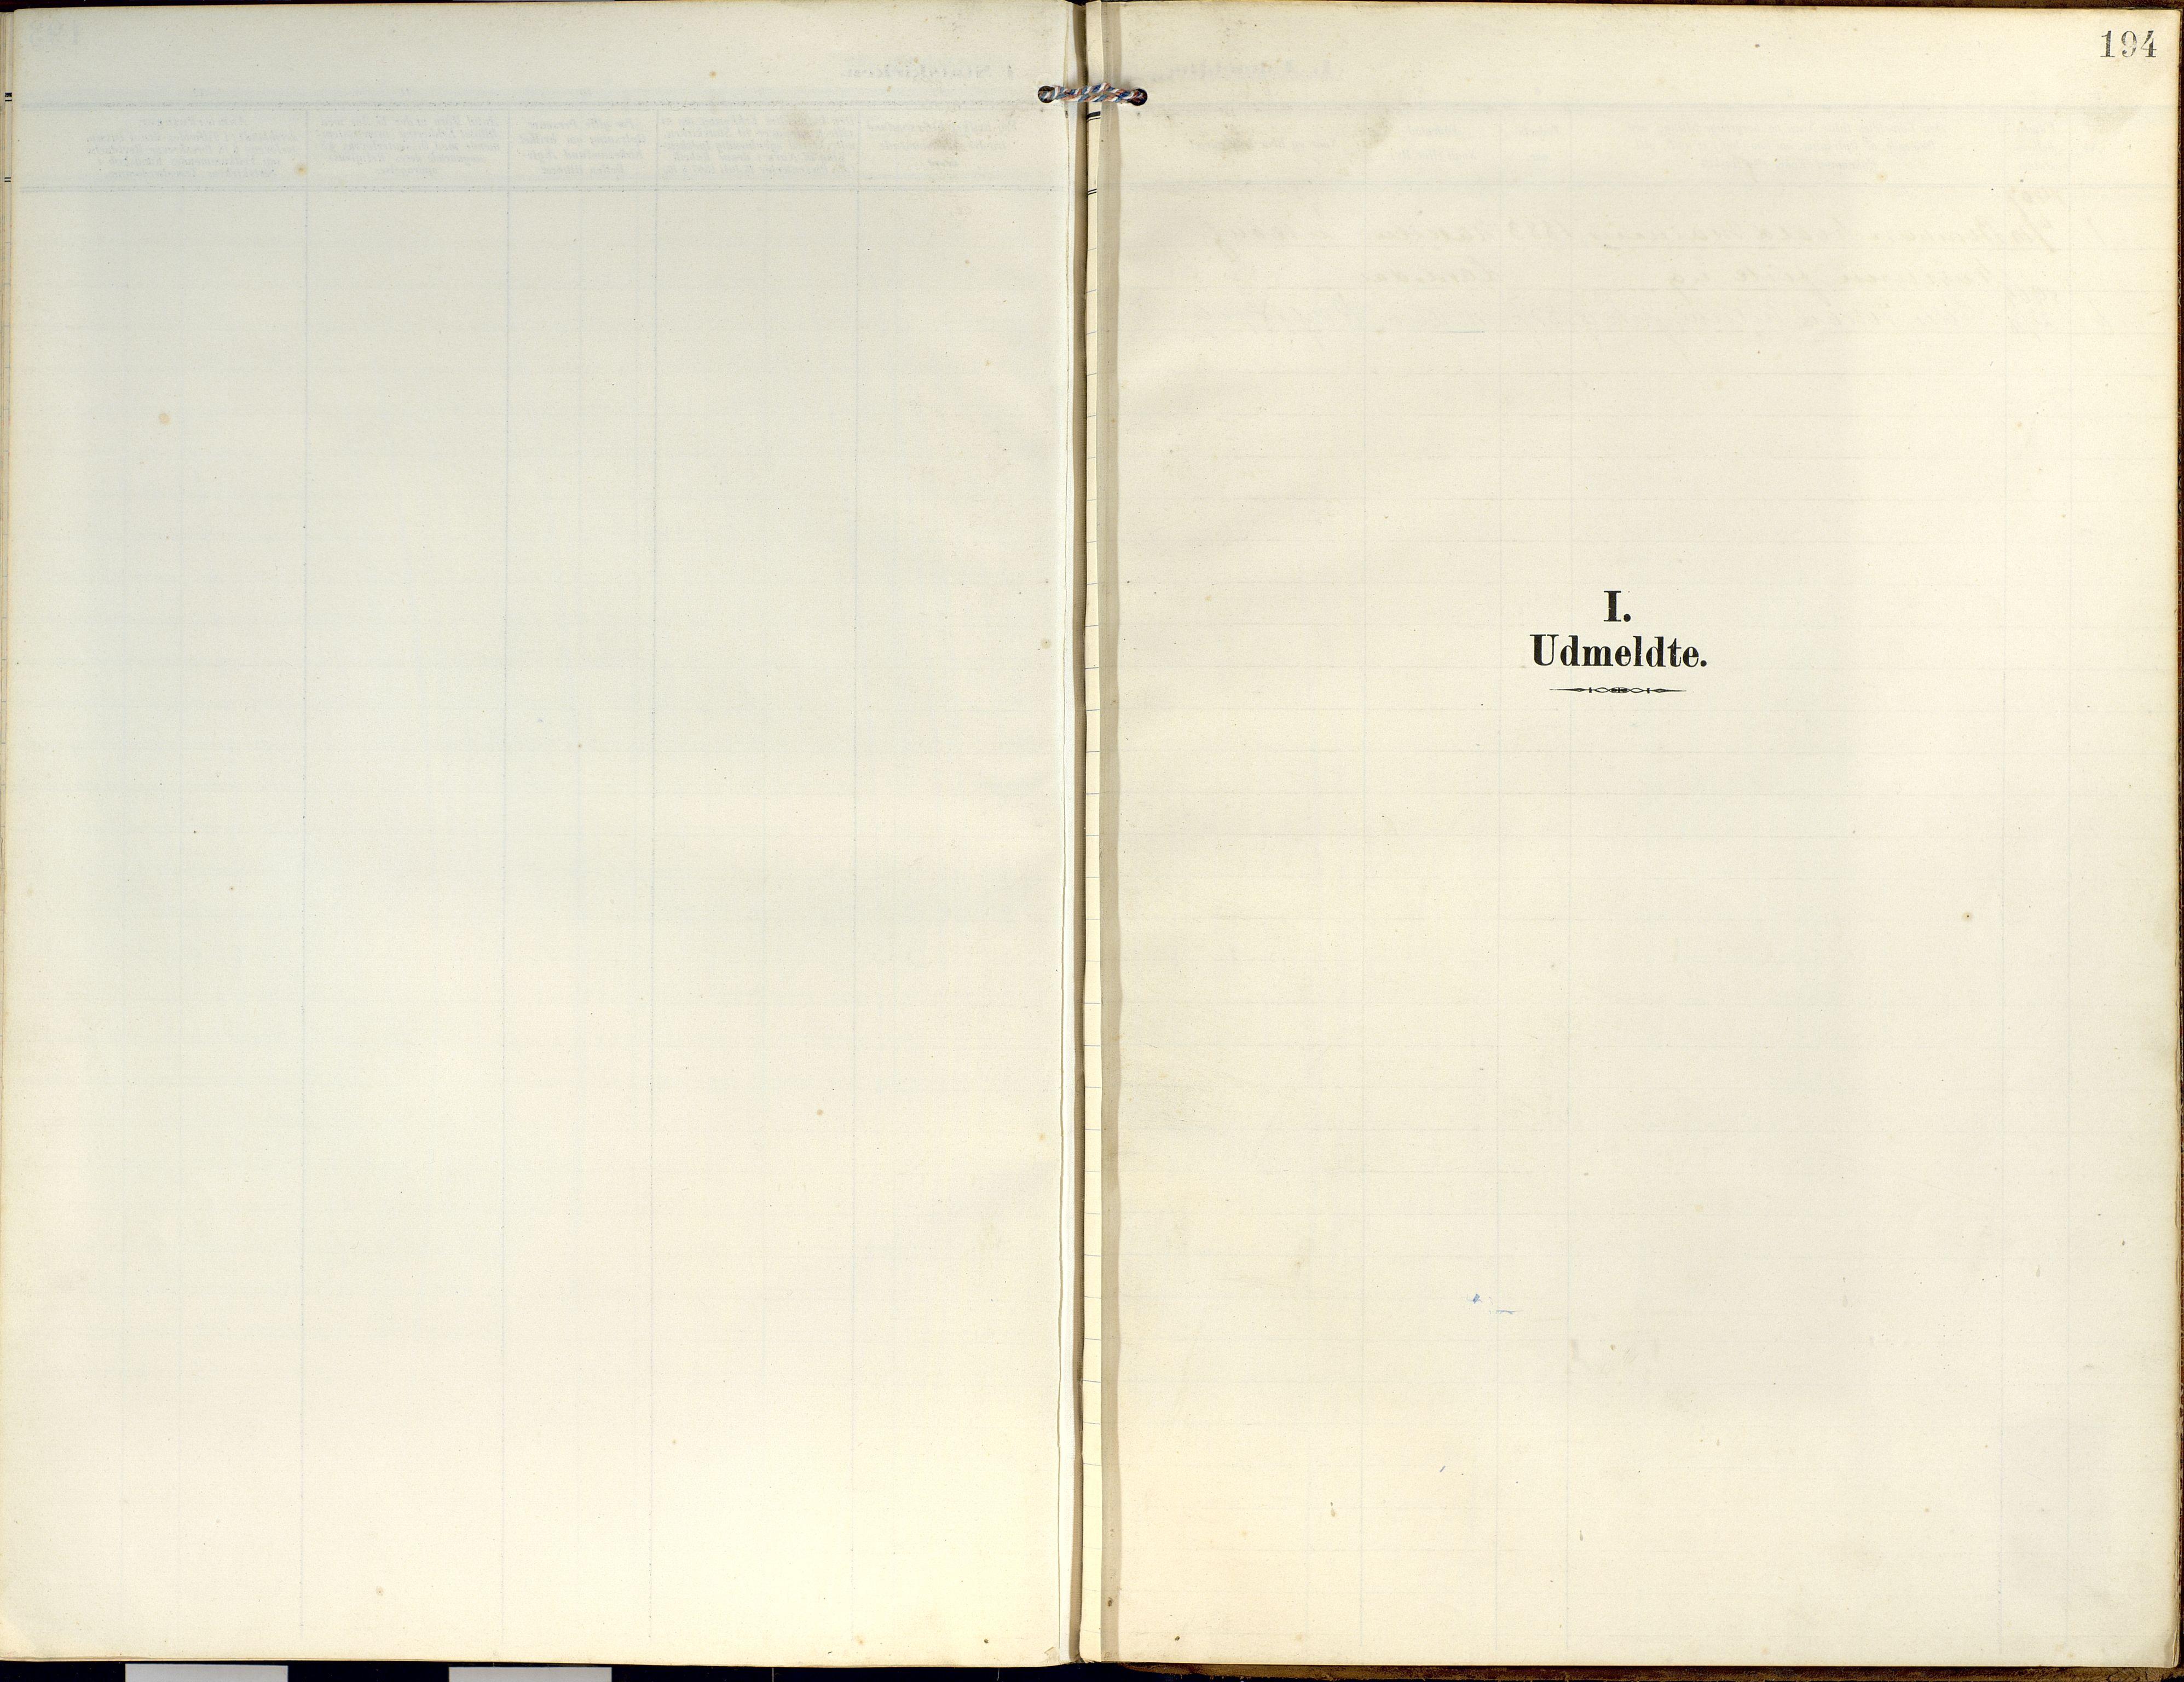 SATØ, Lyngen sokneprestembete, Ministerialbok nr. 14, 1905-1920, s. 194